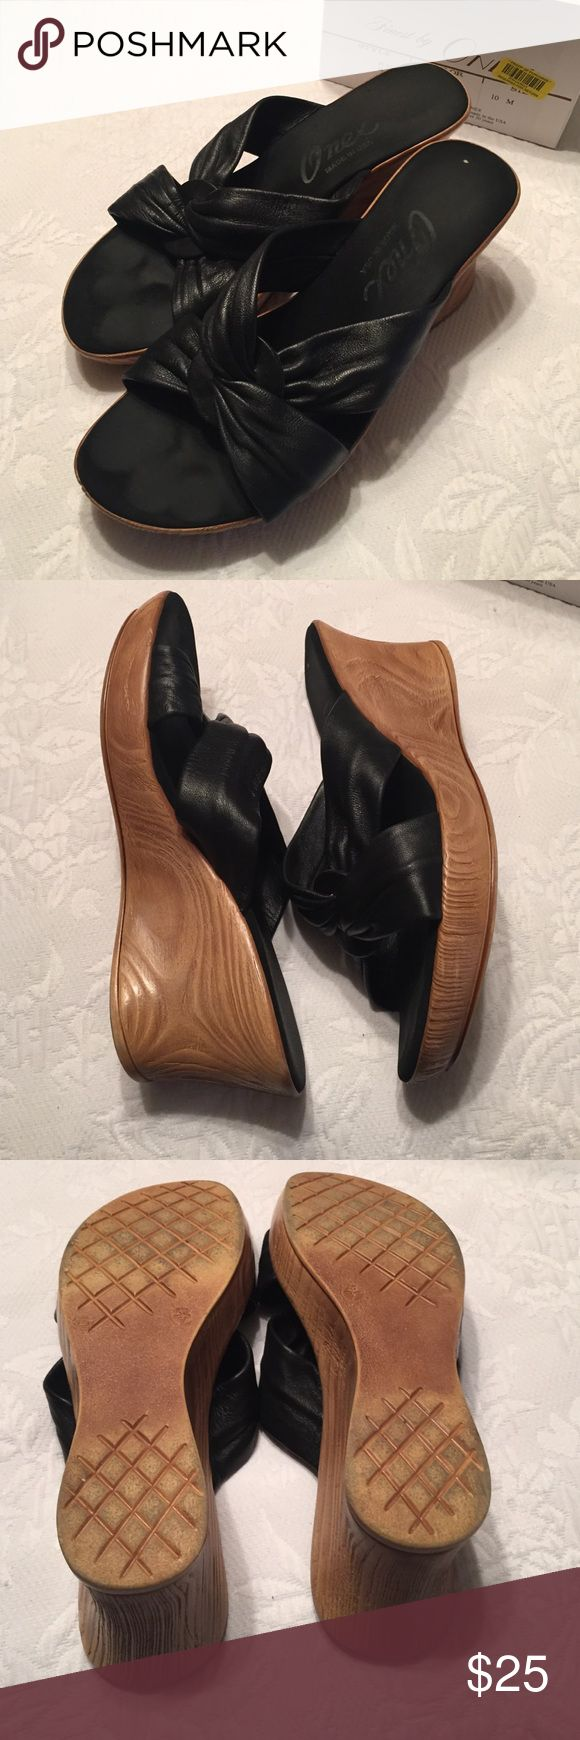 ONEX Shoes Black wedges.   Good condition Onex Shoes Wedges